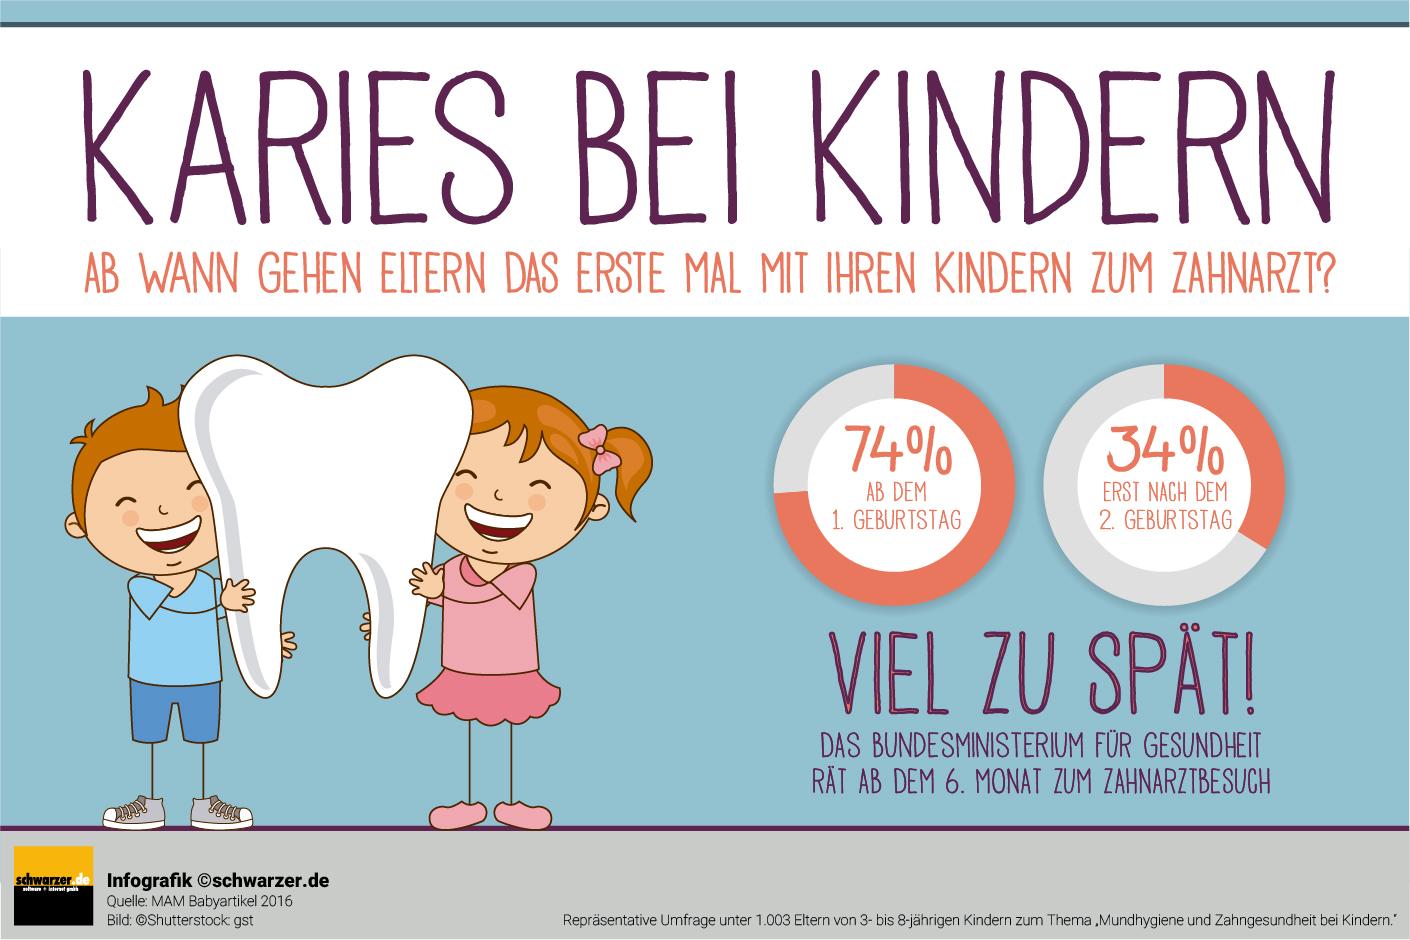 Infografik: Karies bei Kindern